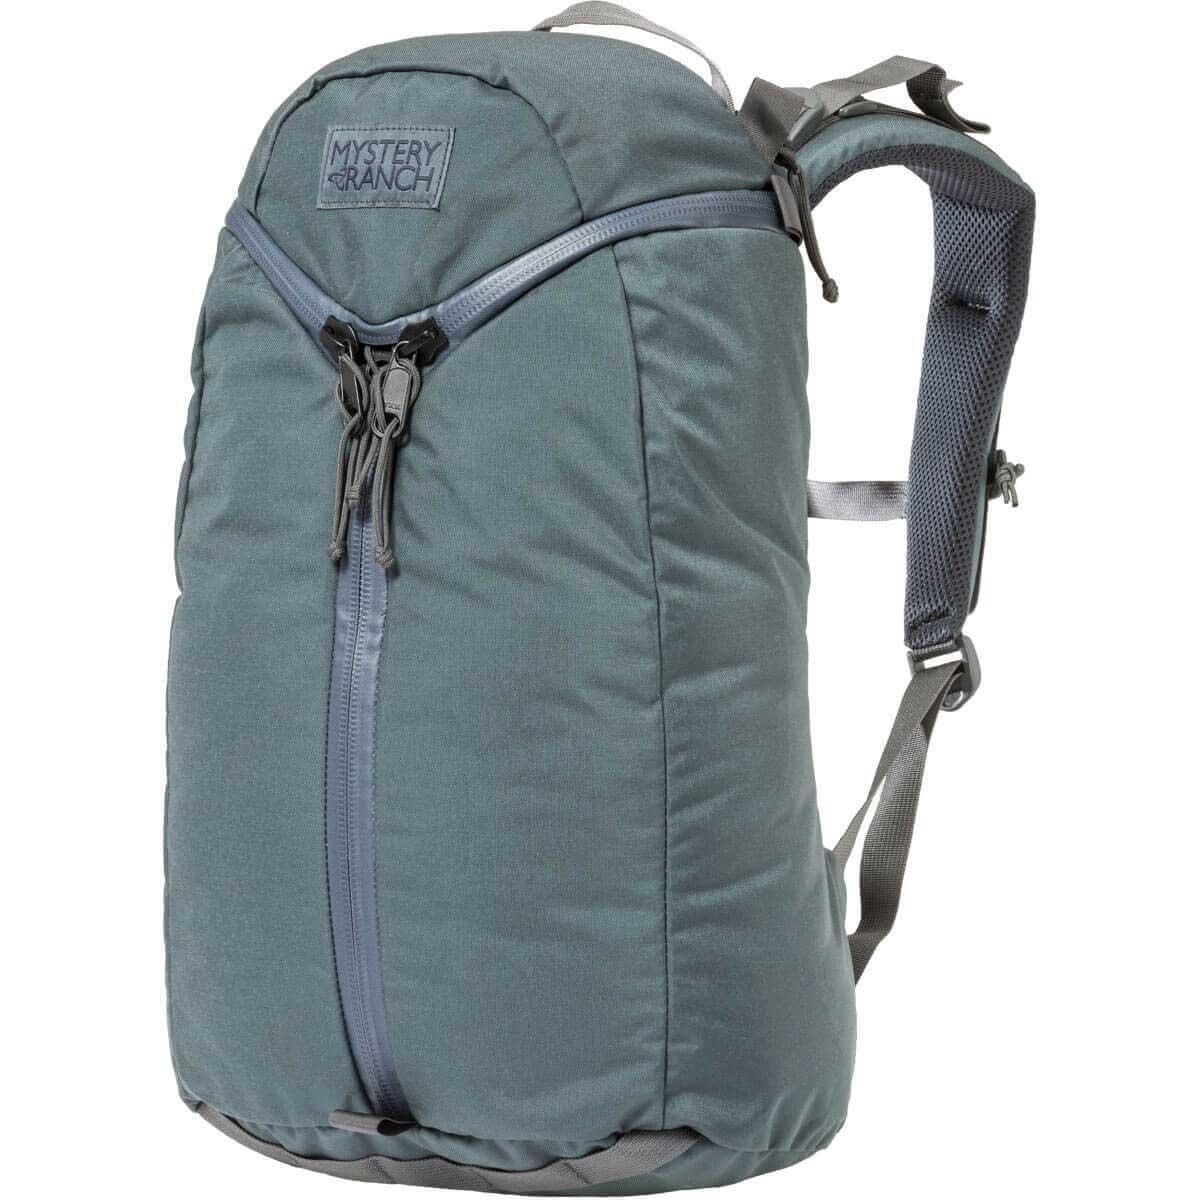 Mystery-Ranch-Urban-Assault-Backpack